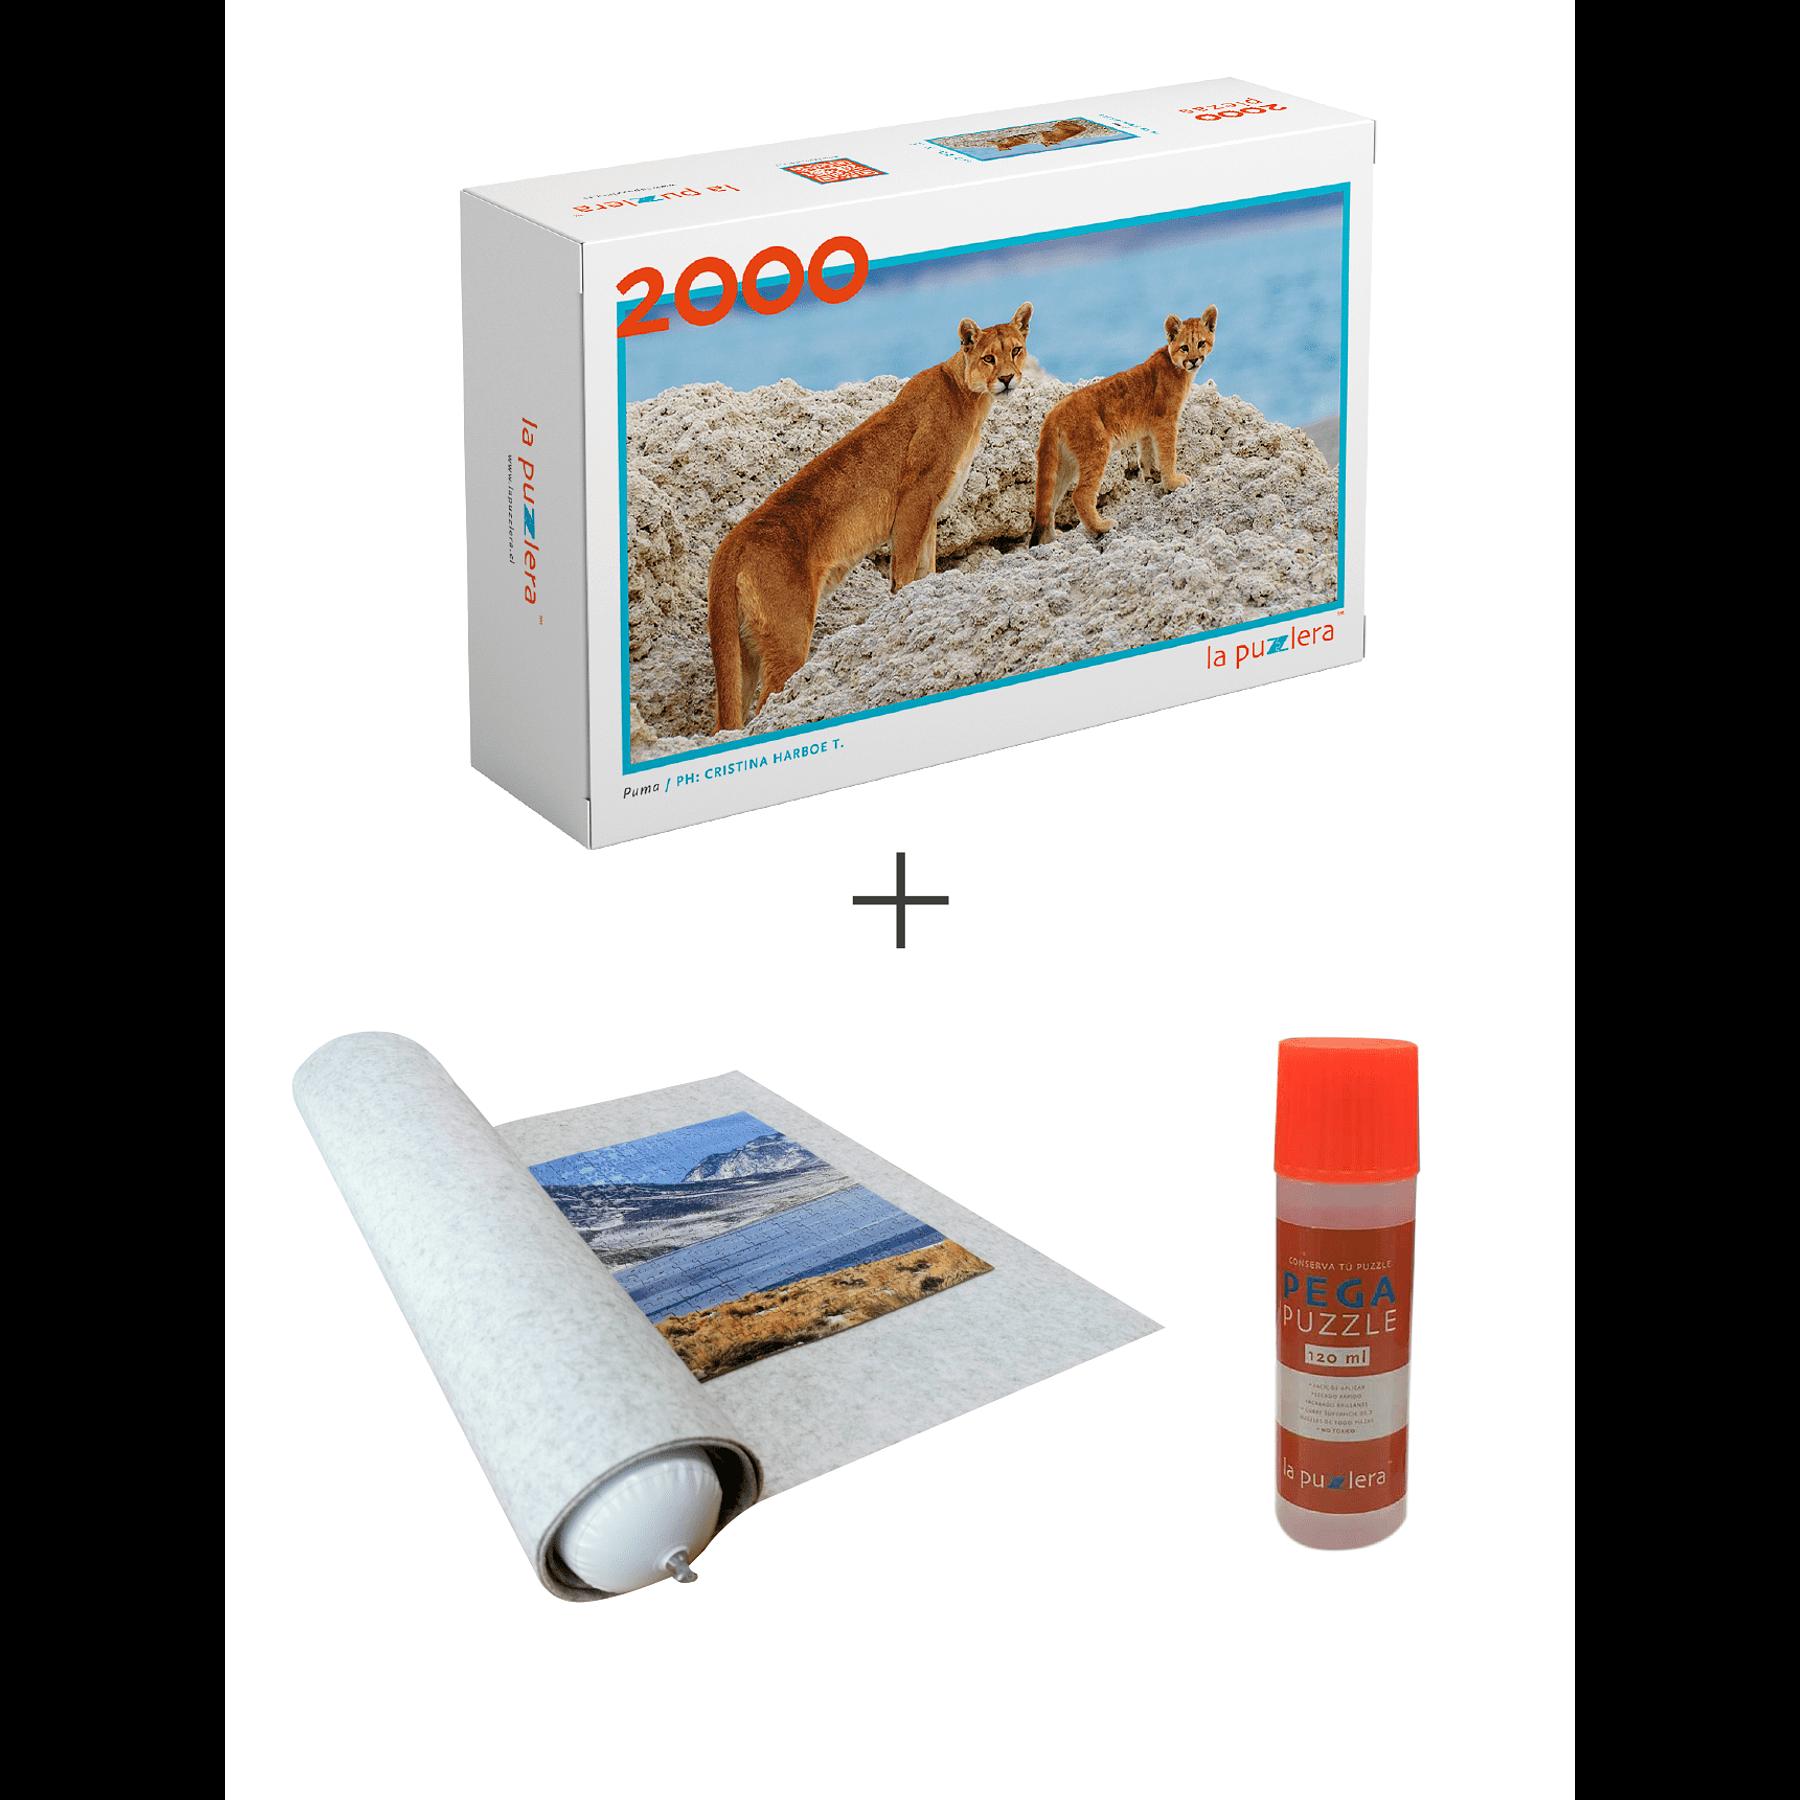 Puzzle Fauna Chilena + Puzzle Mat + Pega Puzzle